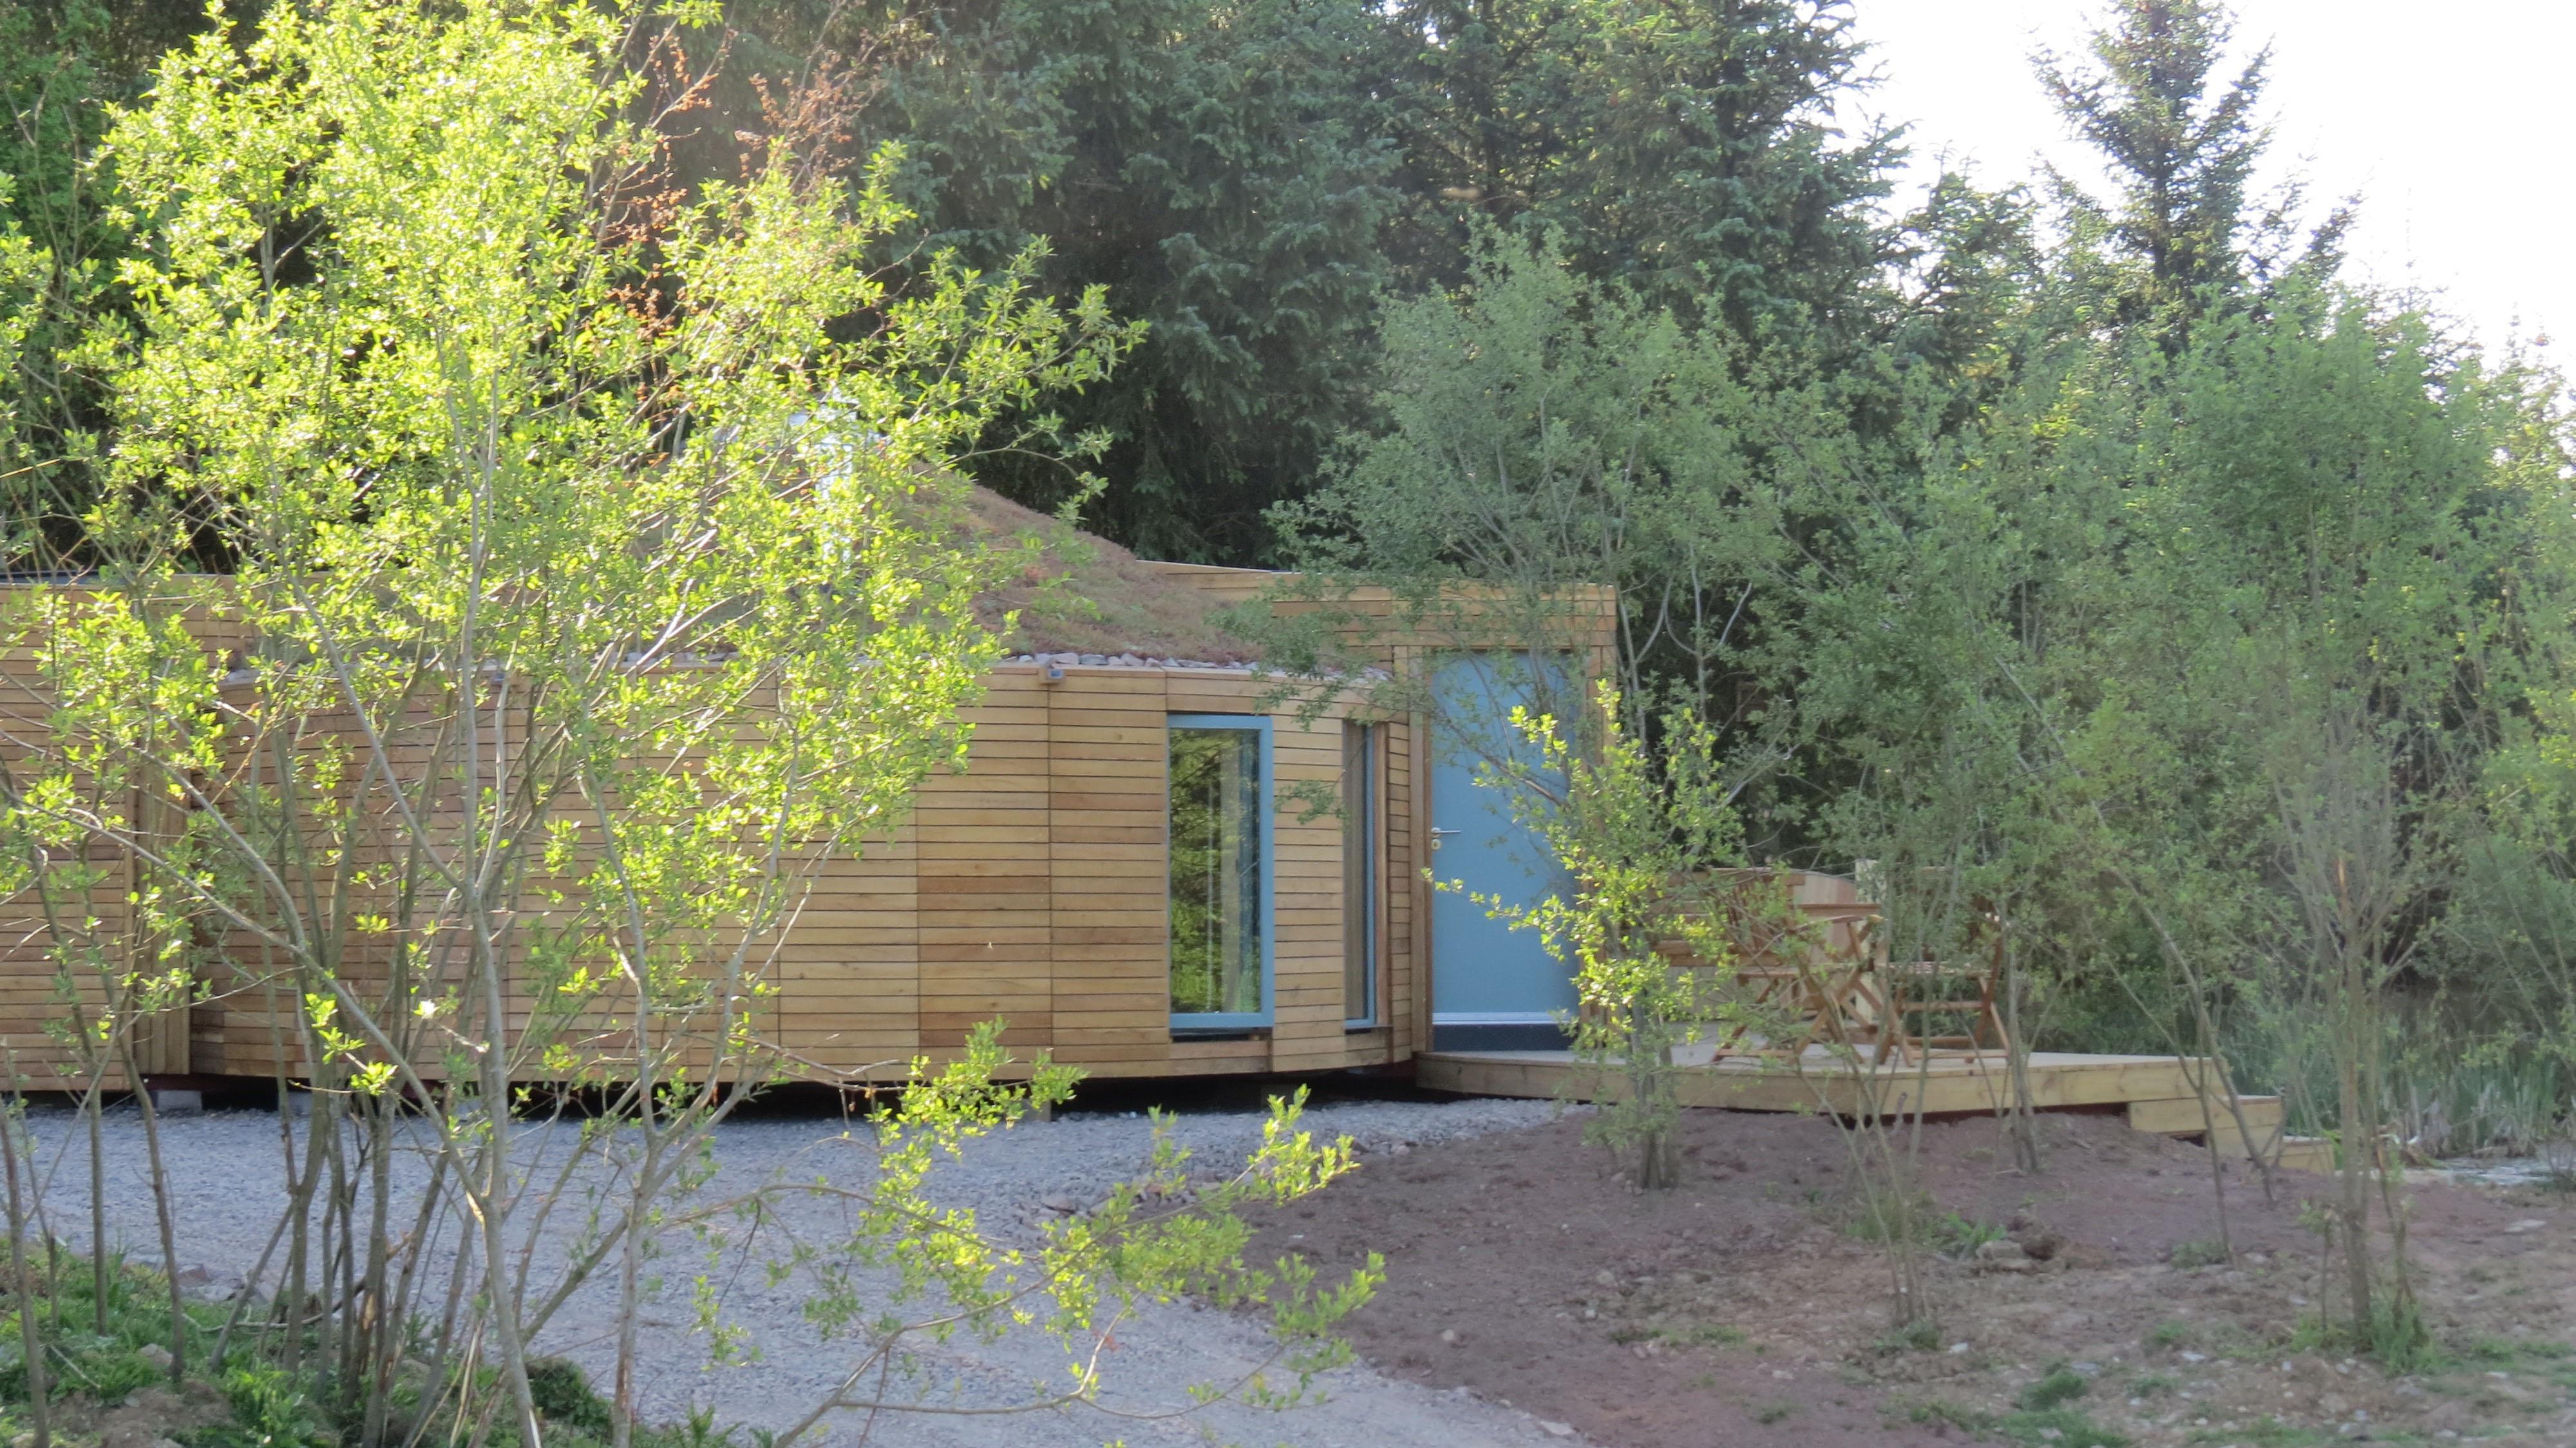 Yurt exterior 2 HR